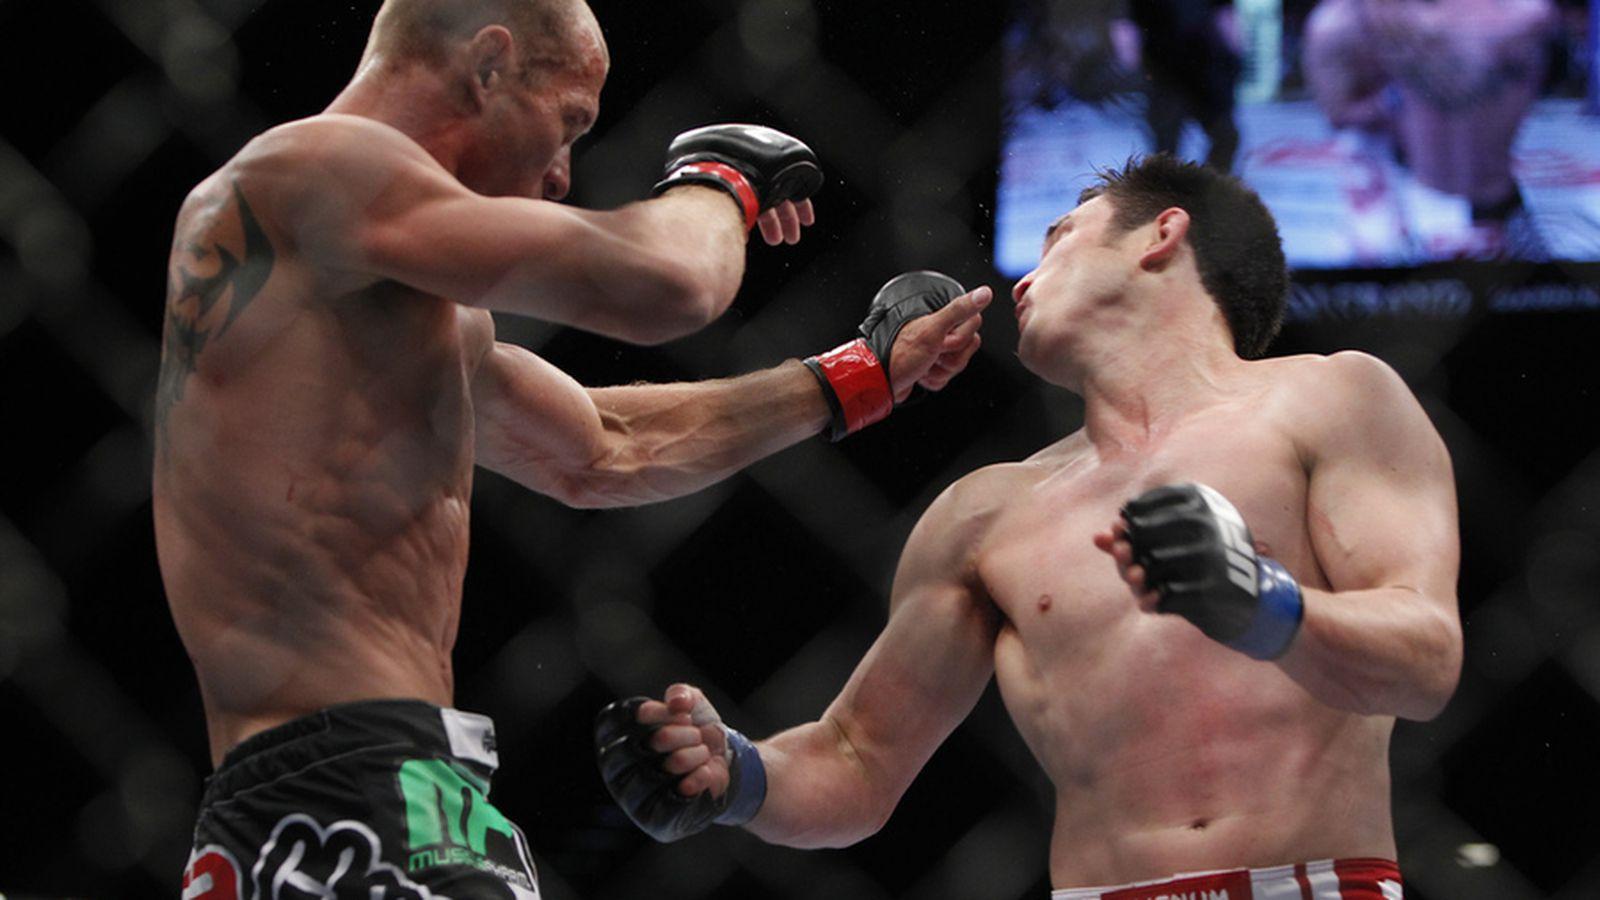 UFC 160 results recap: Donald Cerrone vs K.J. Noons fight